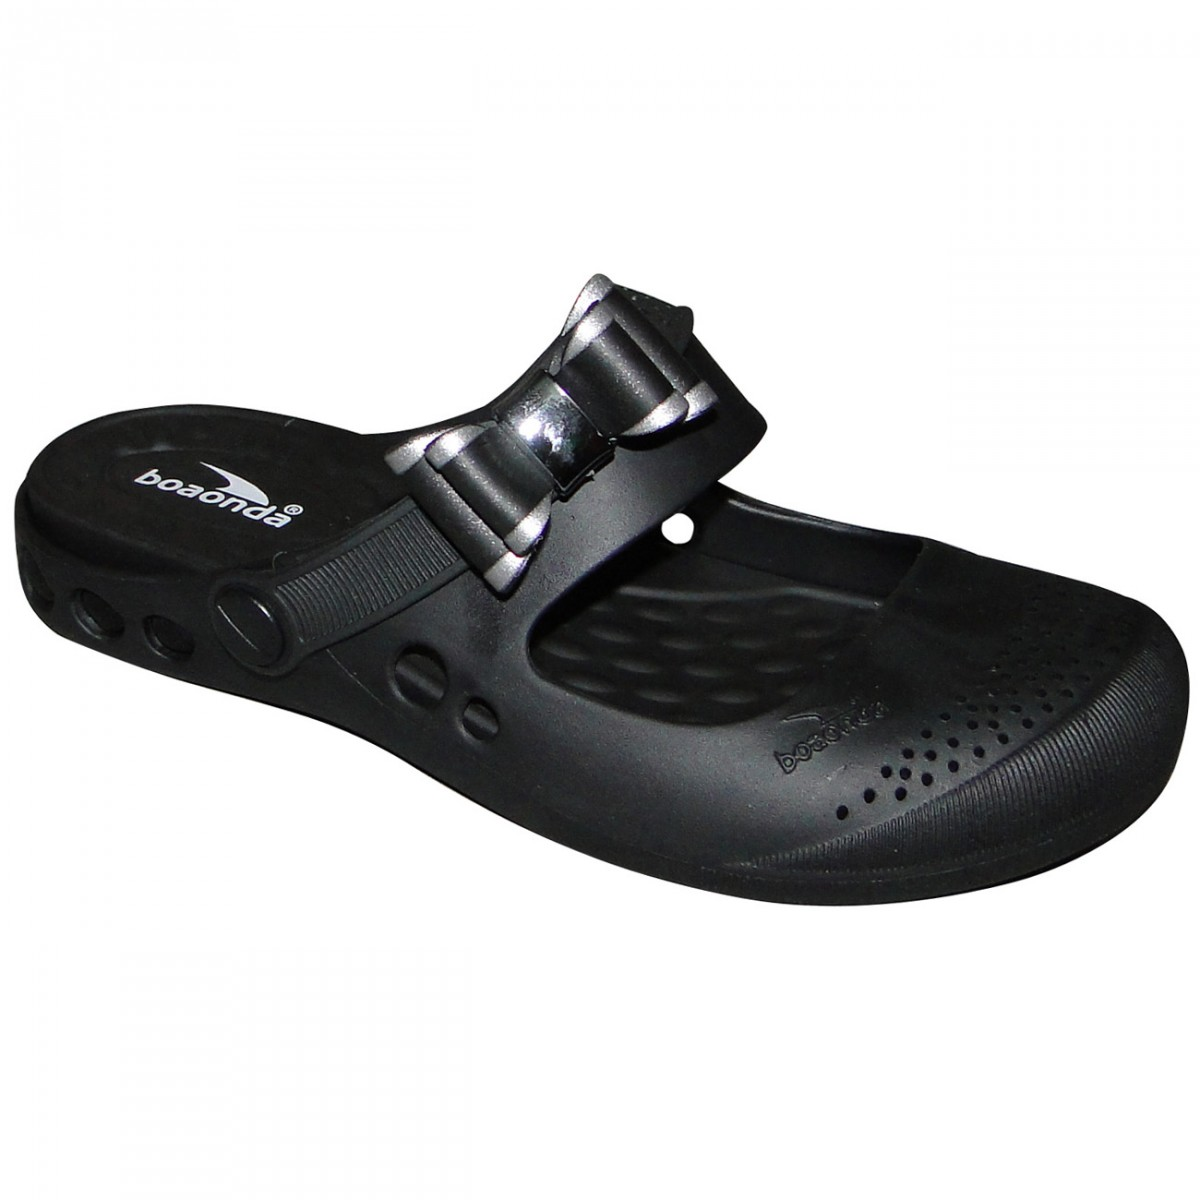 fbfd65920a Crocs Boaonda 1170 Ibiza 1170-001 001 - Preto - Chuteira Nike ...